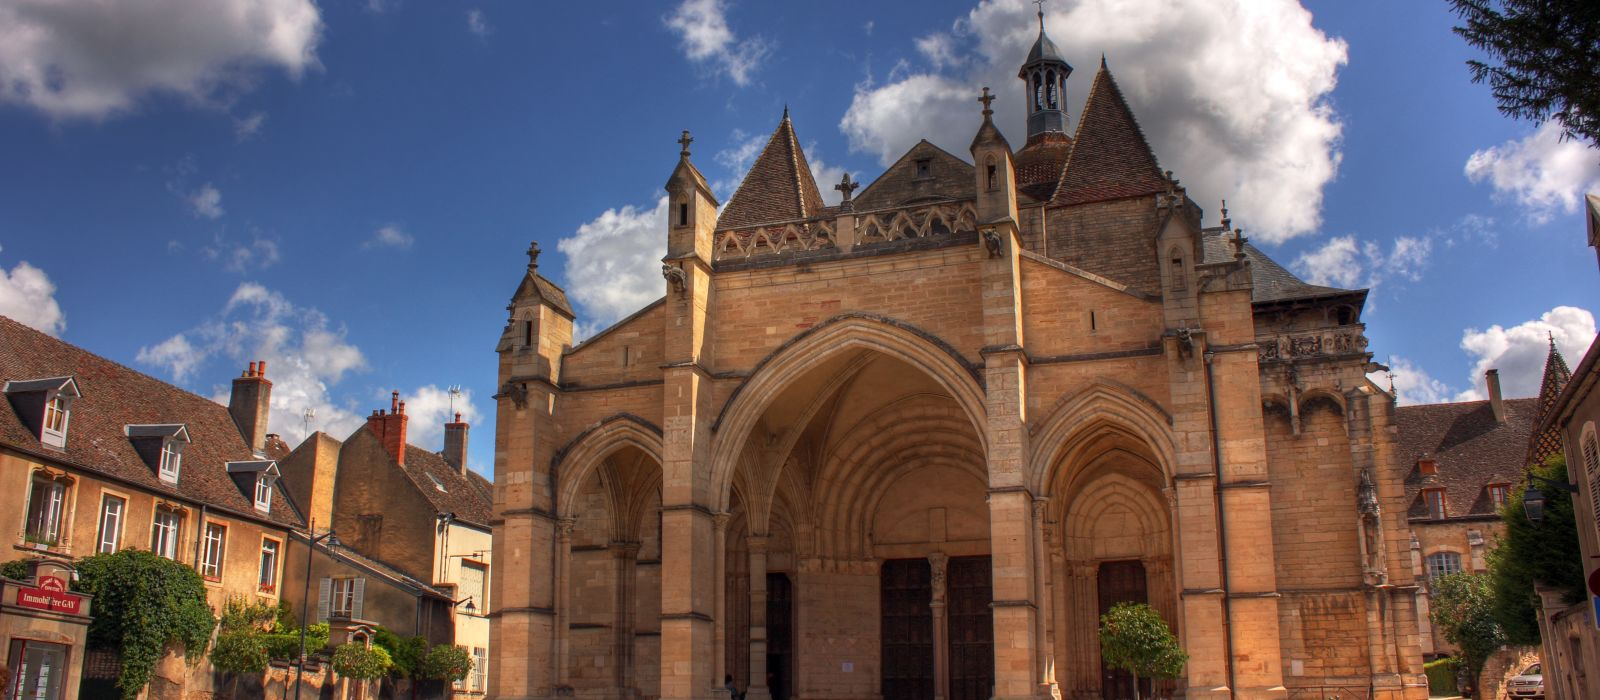 Destination Burgundy Region: Beaune France